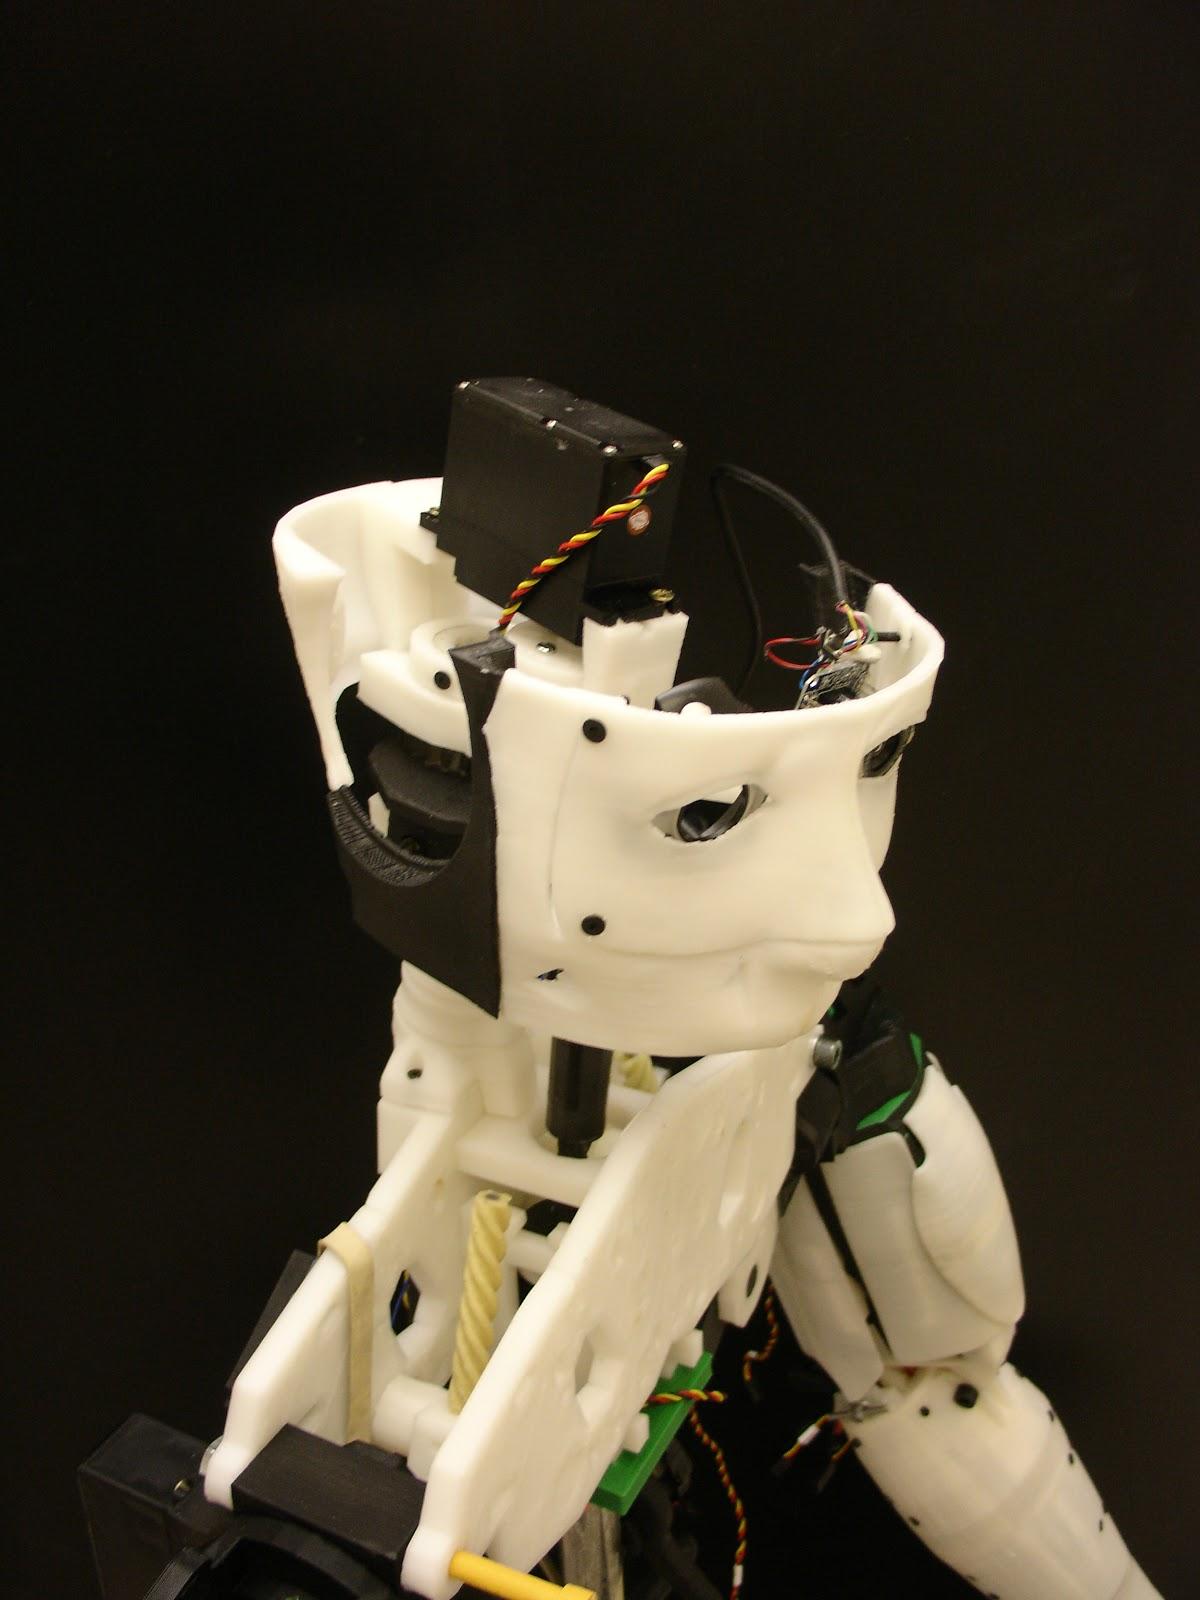 gallery v2  u2013 inmoov robot diagram block robot diagram block robot diagram block robot diagram block